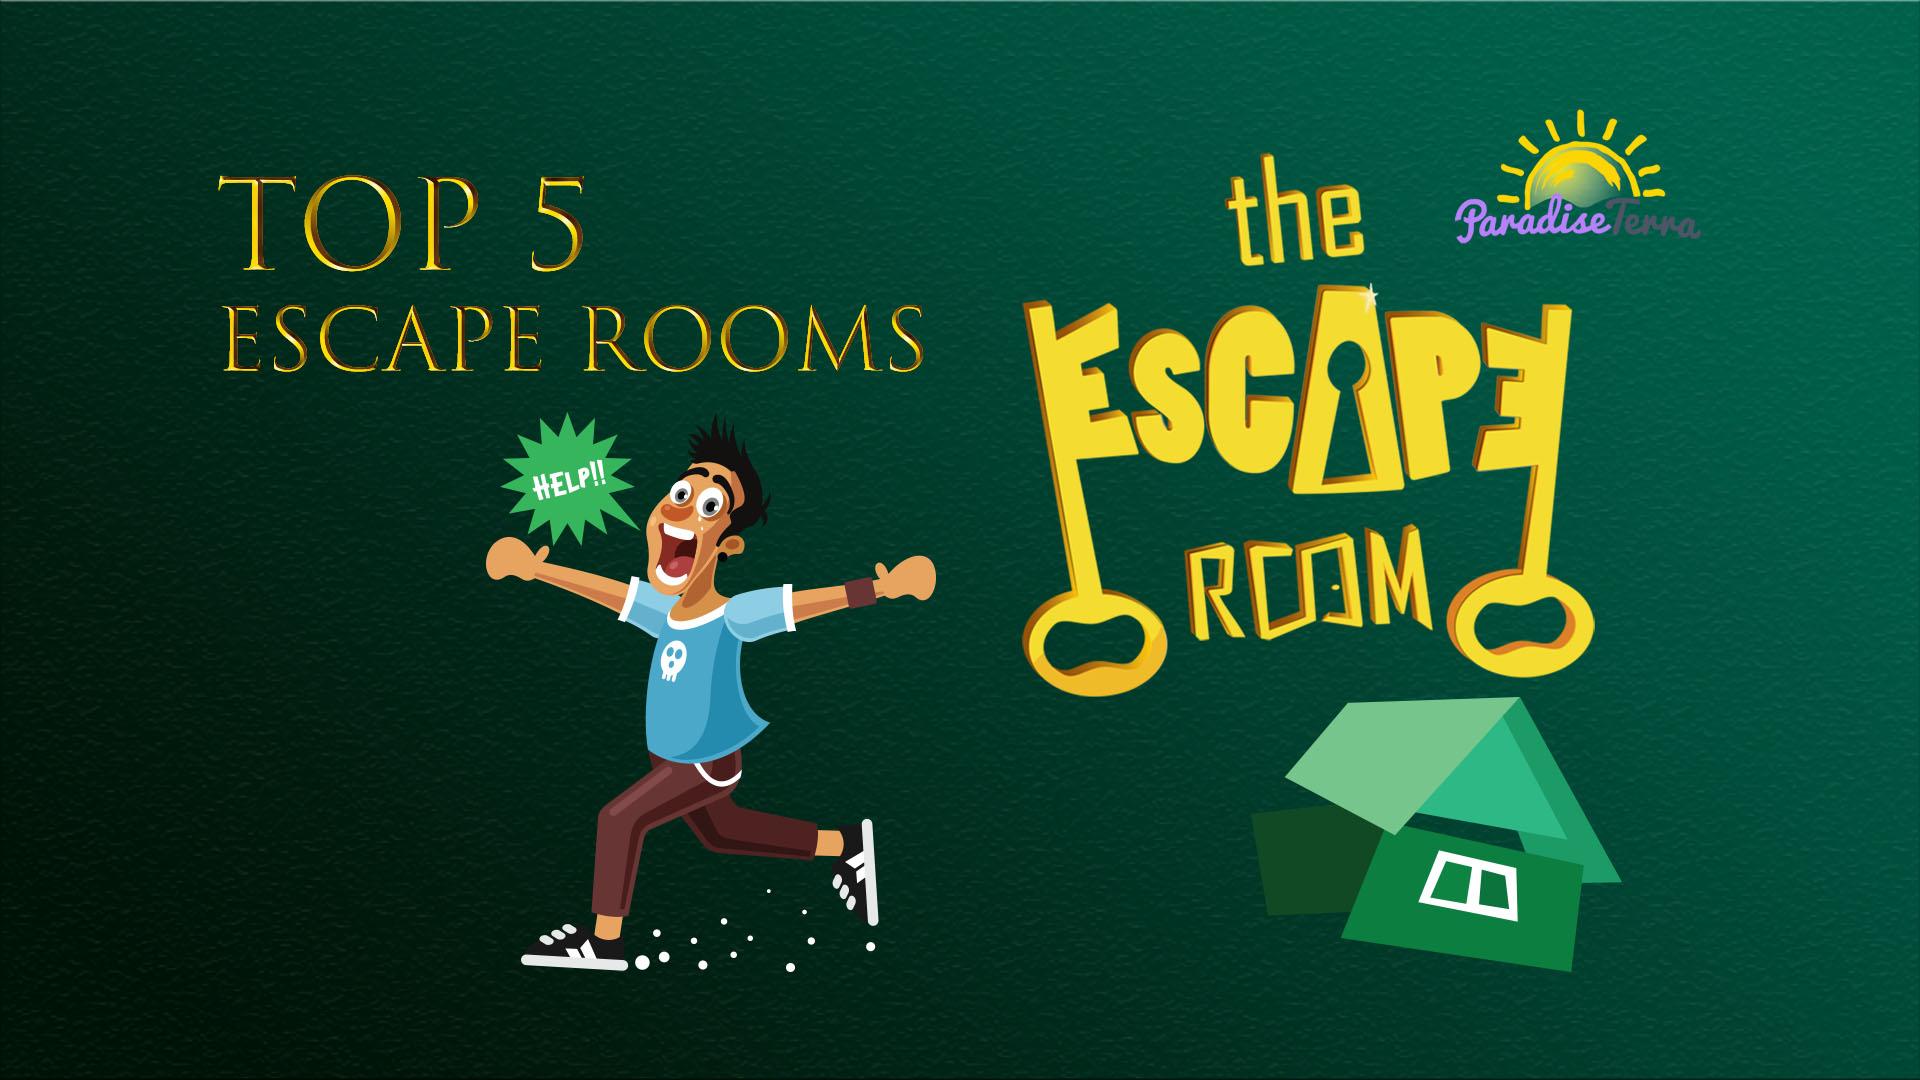 Top 5 Escape Rooms